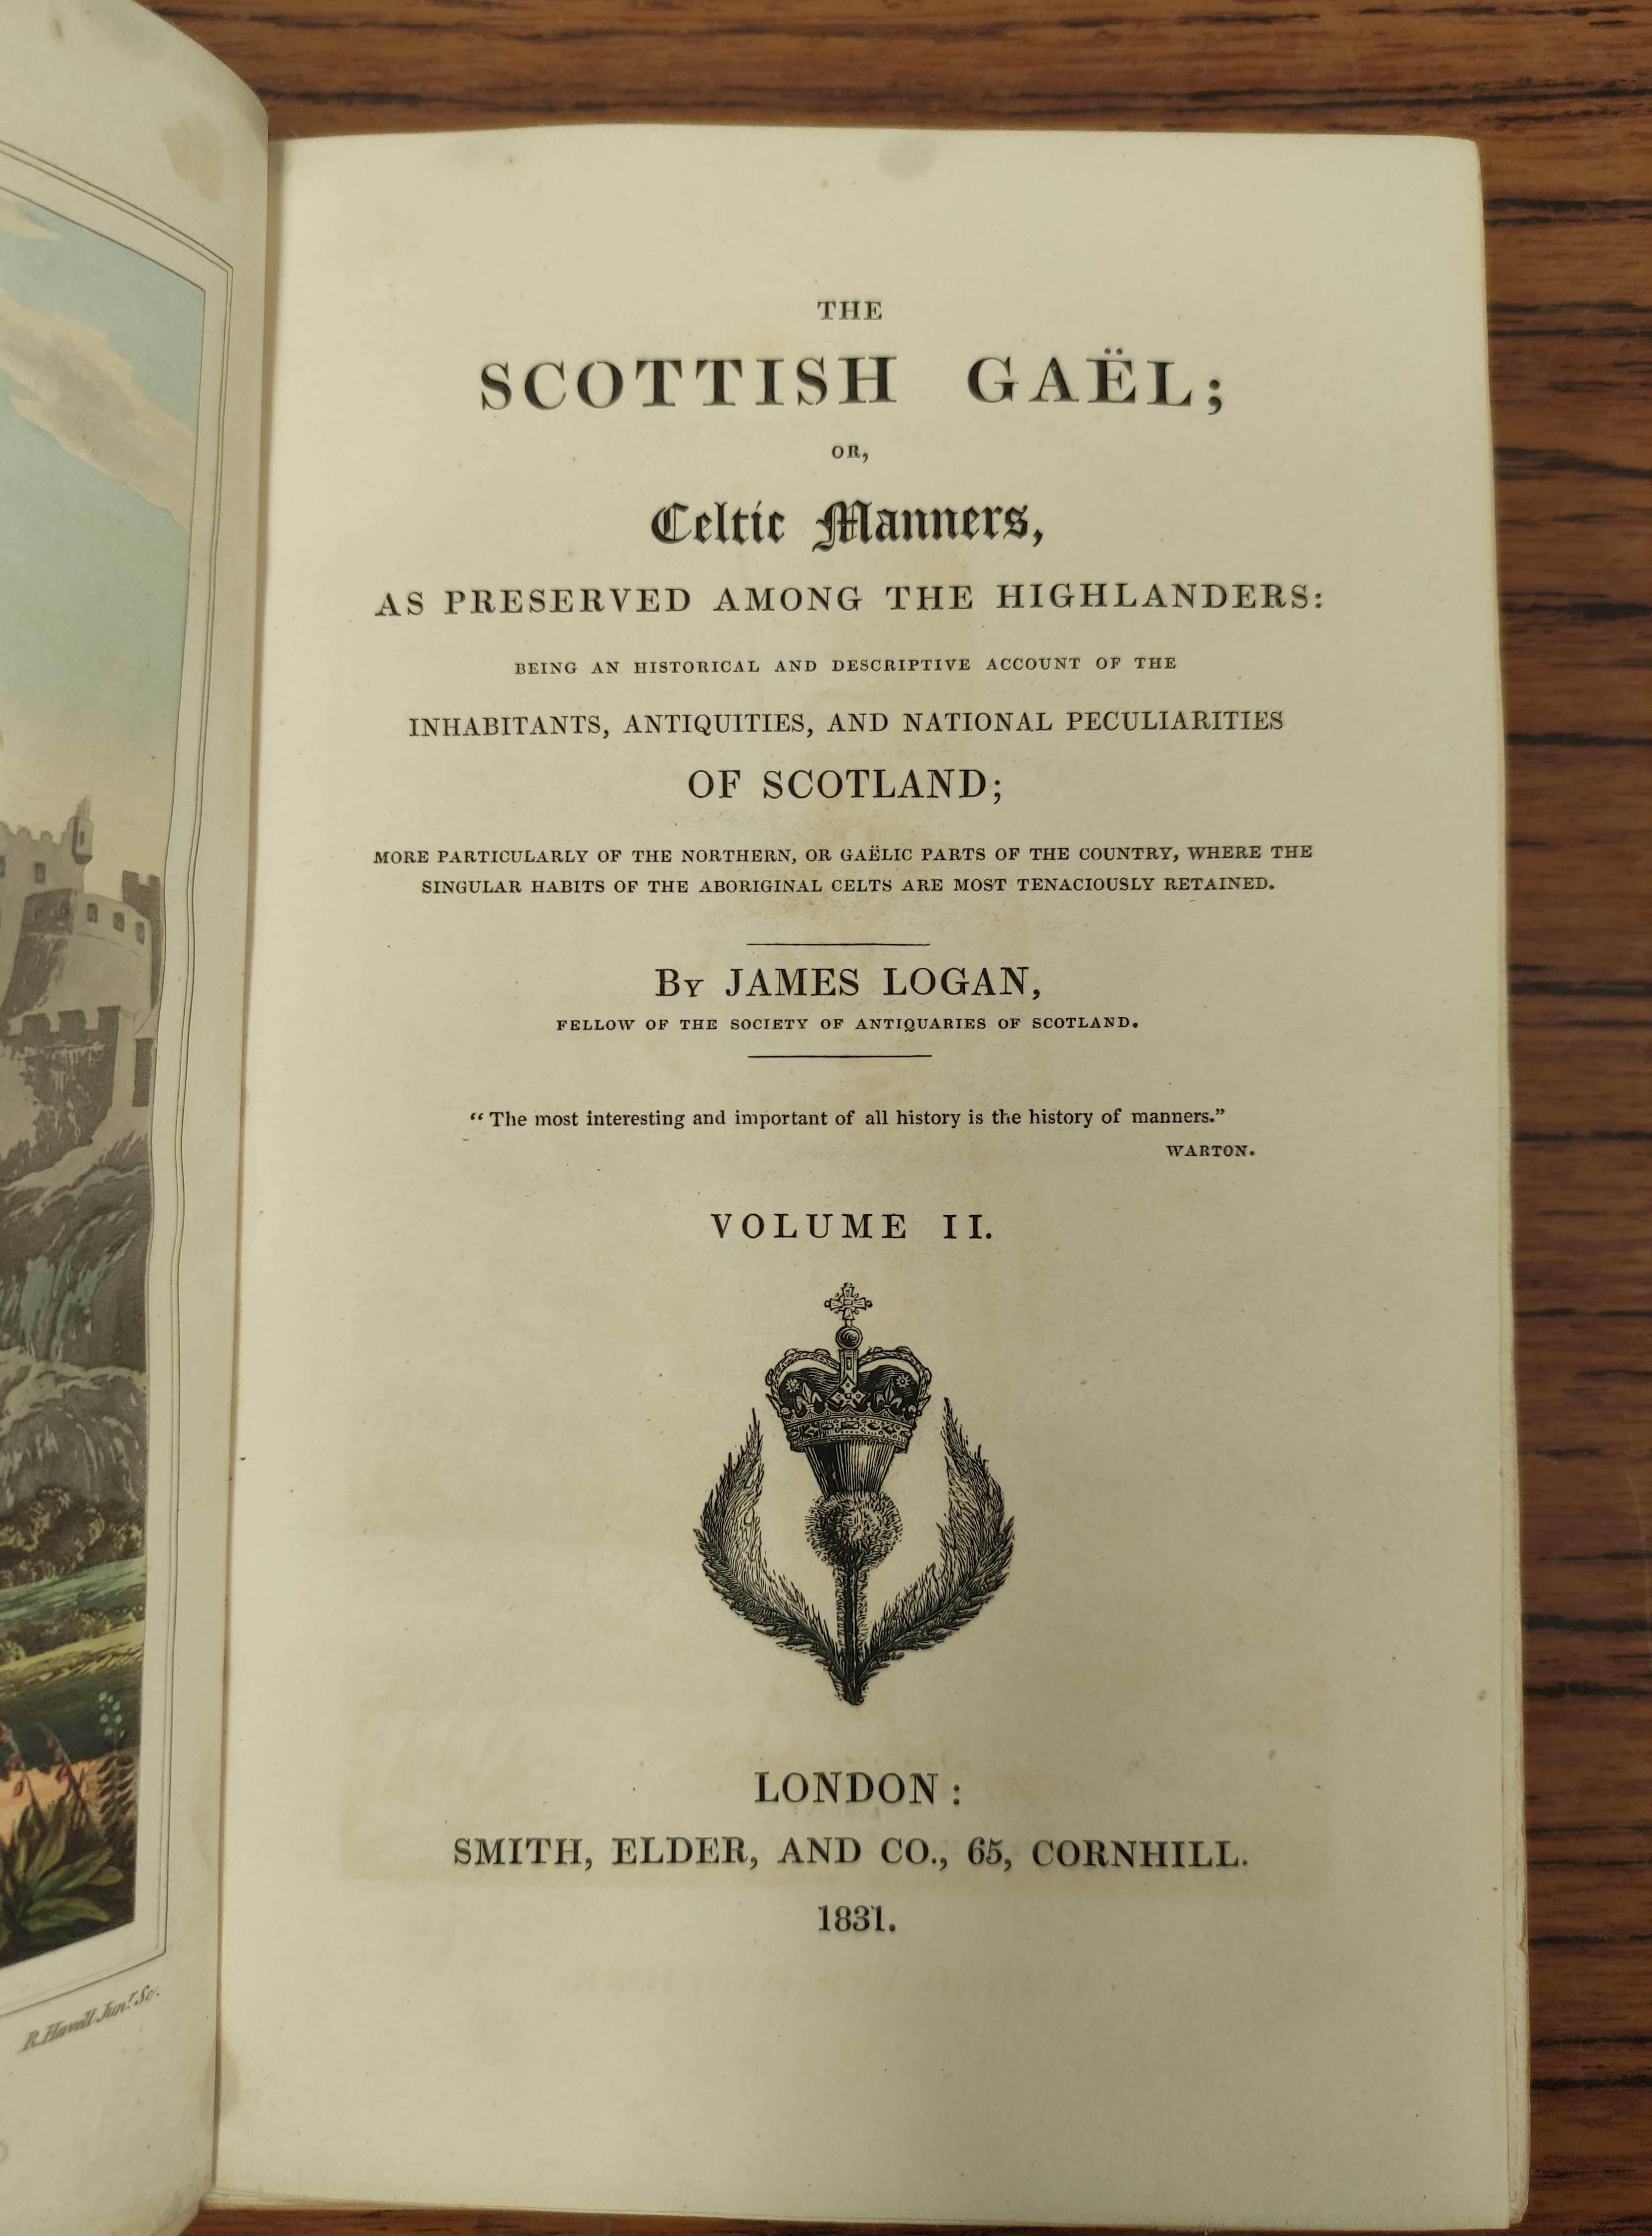 LOGAN JAMES.The Scottish Gael. 2 vols. Col. frontis & text illus. Half green morocco. A nice - Image 8 of 10